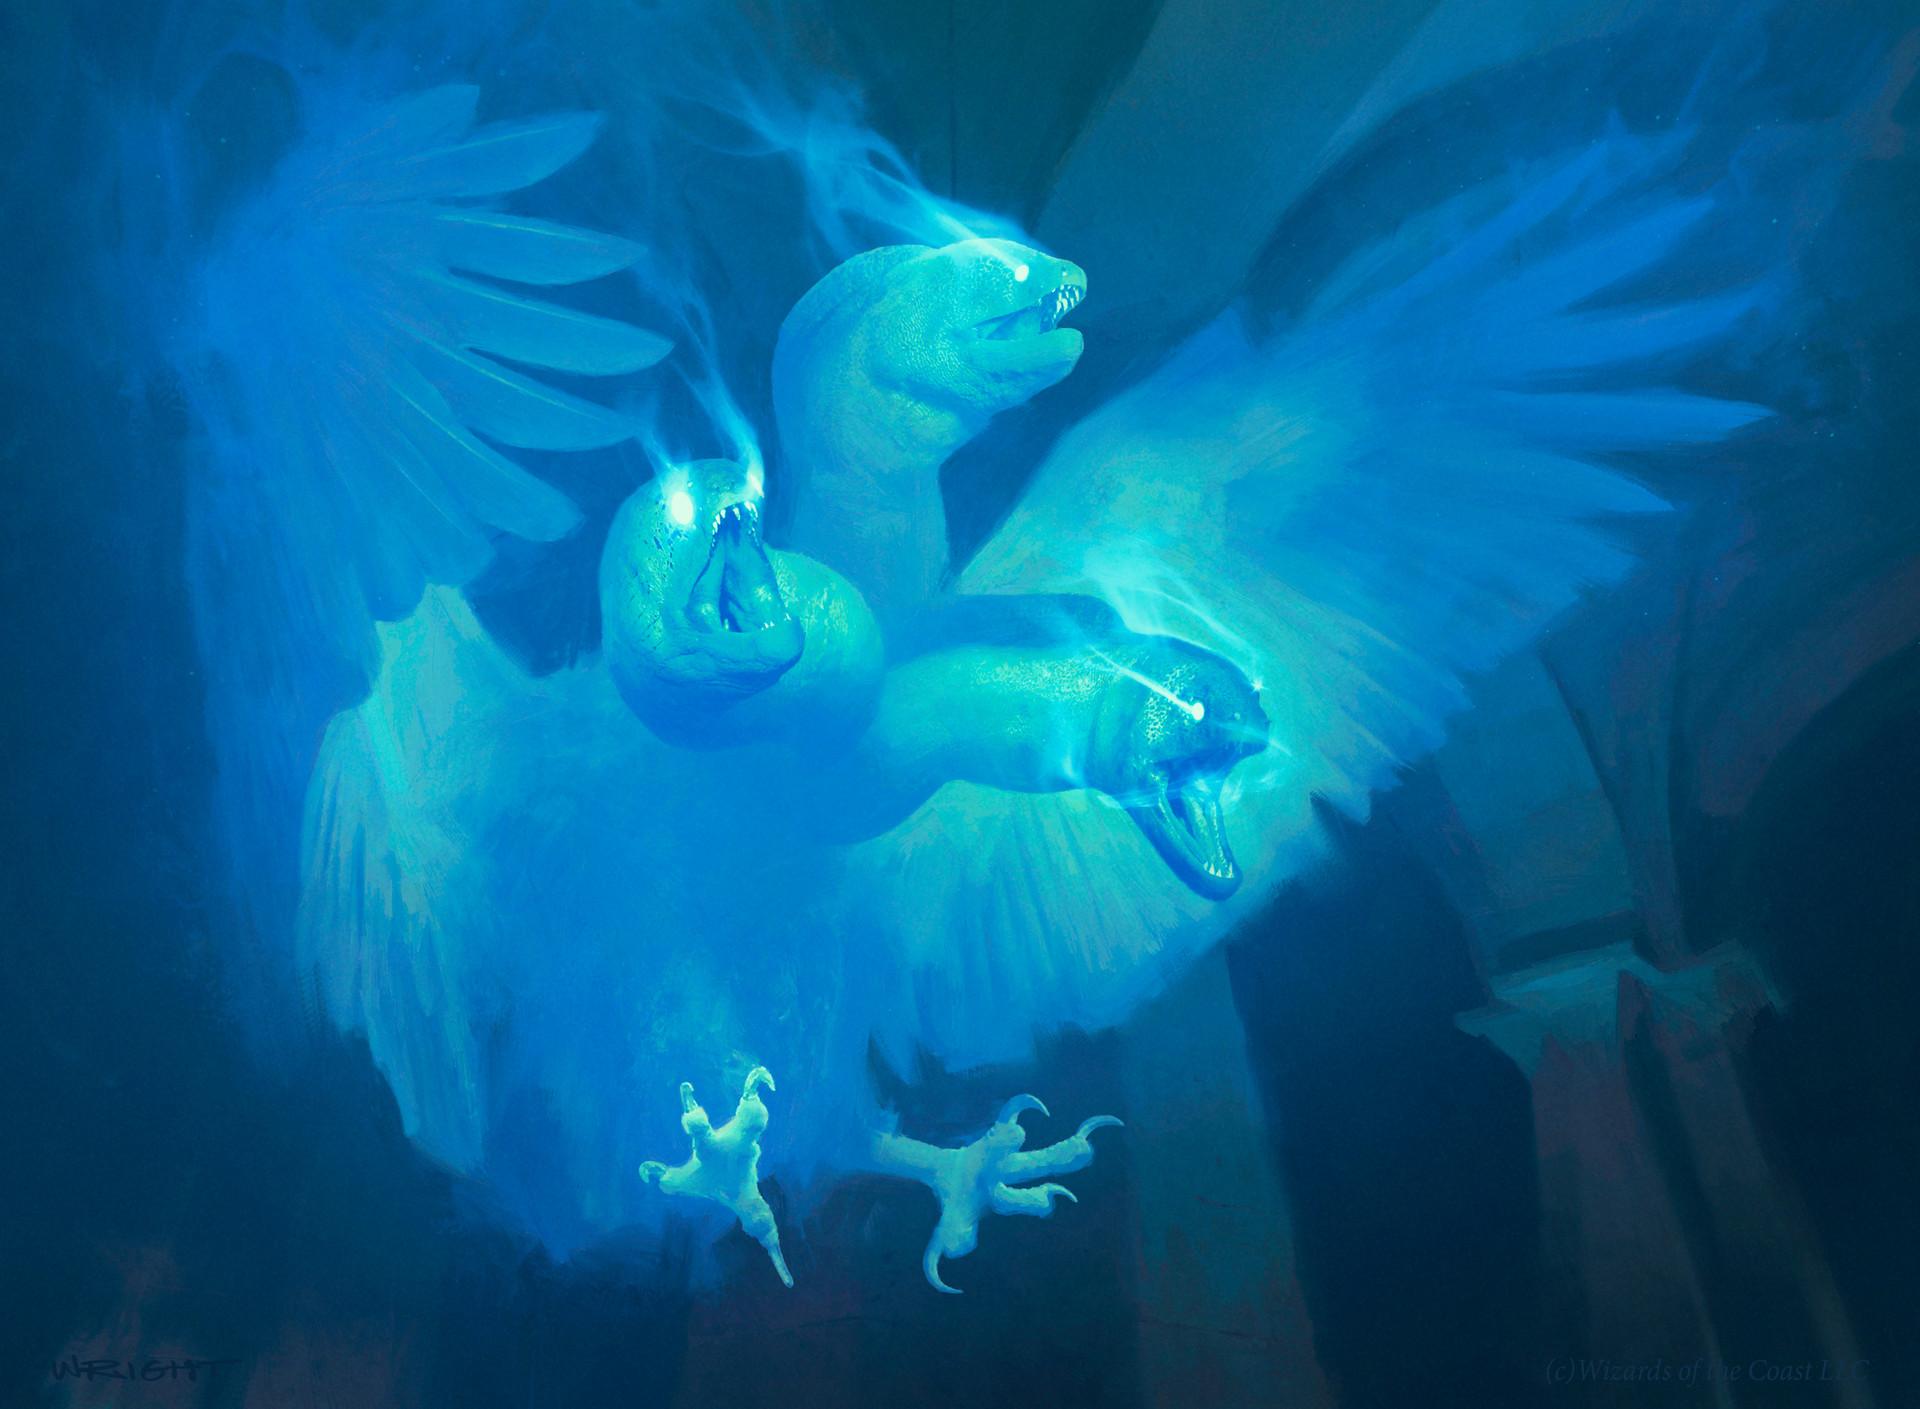 Richard wright 20150610 rw wotc 161553 phantom monster